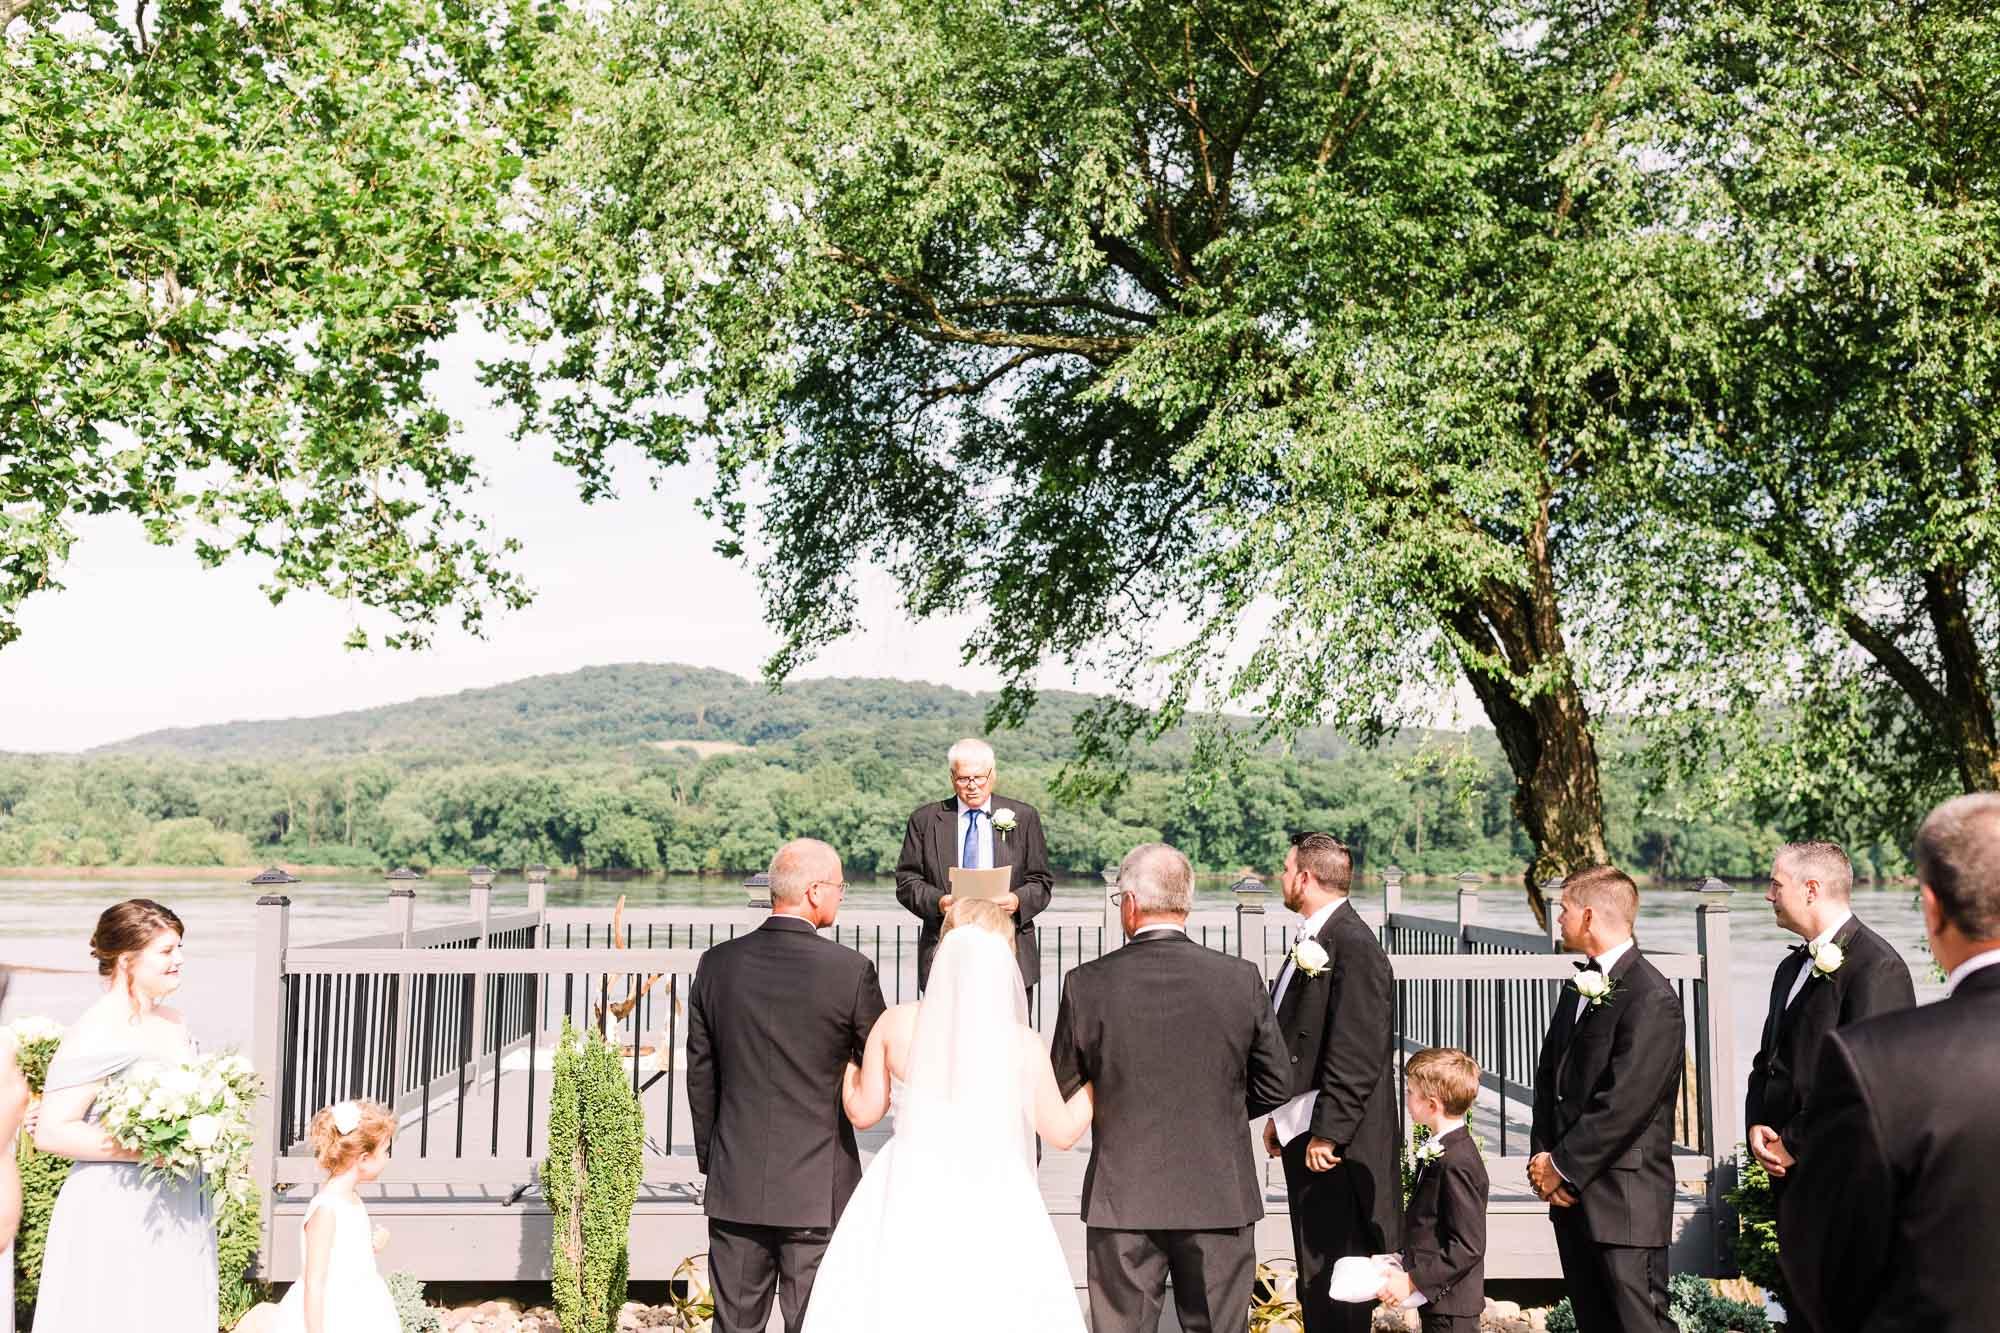 isle-of-que-wedding-6720.jpg